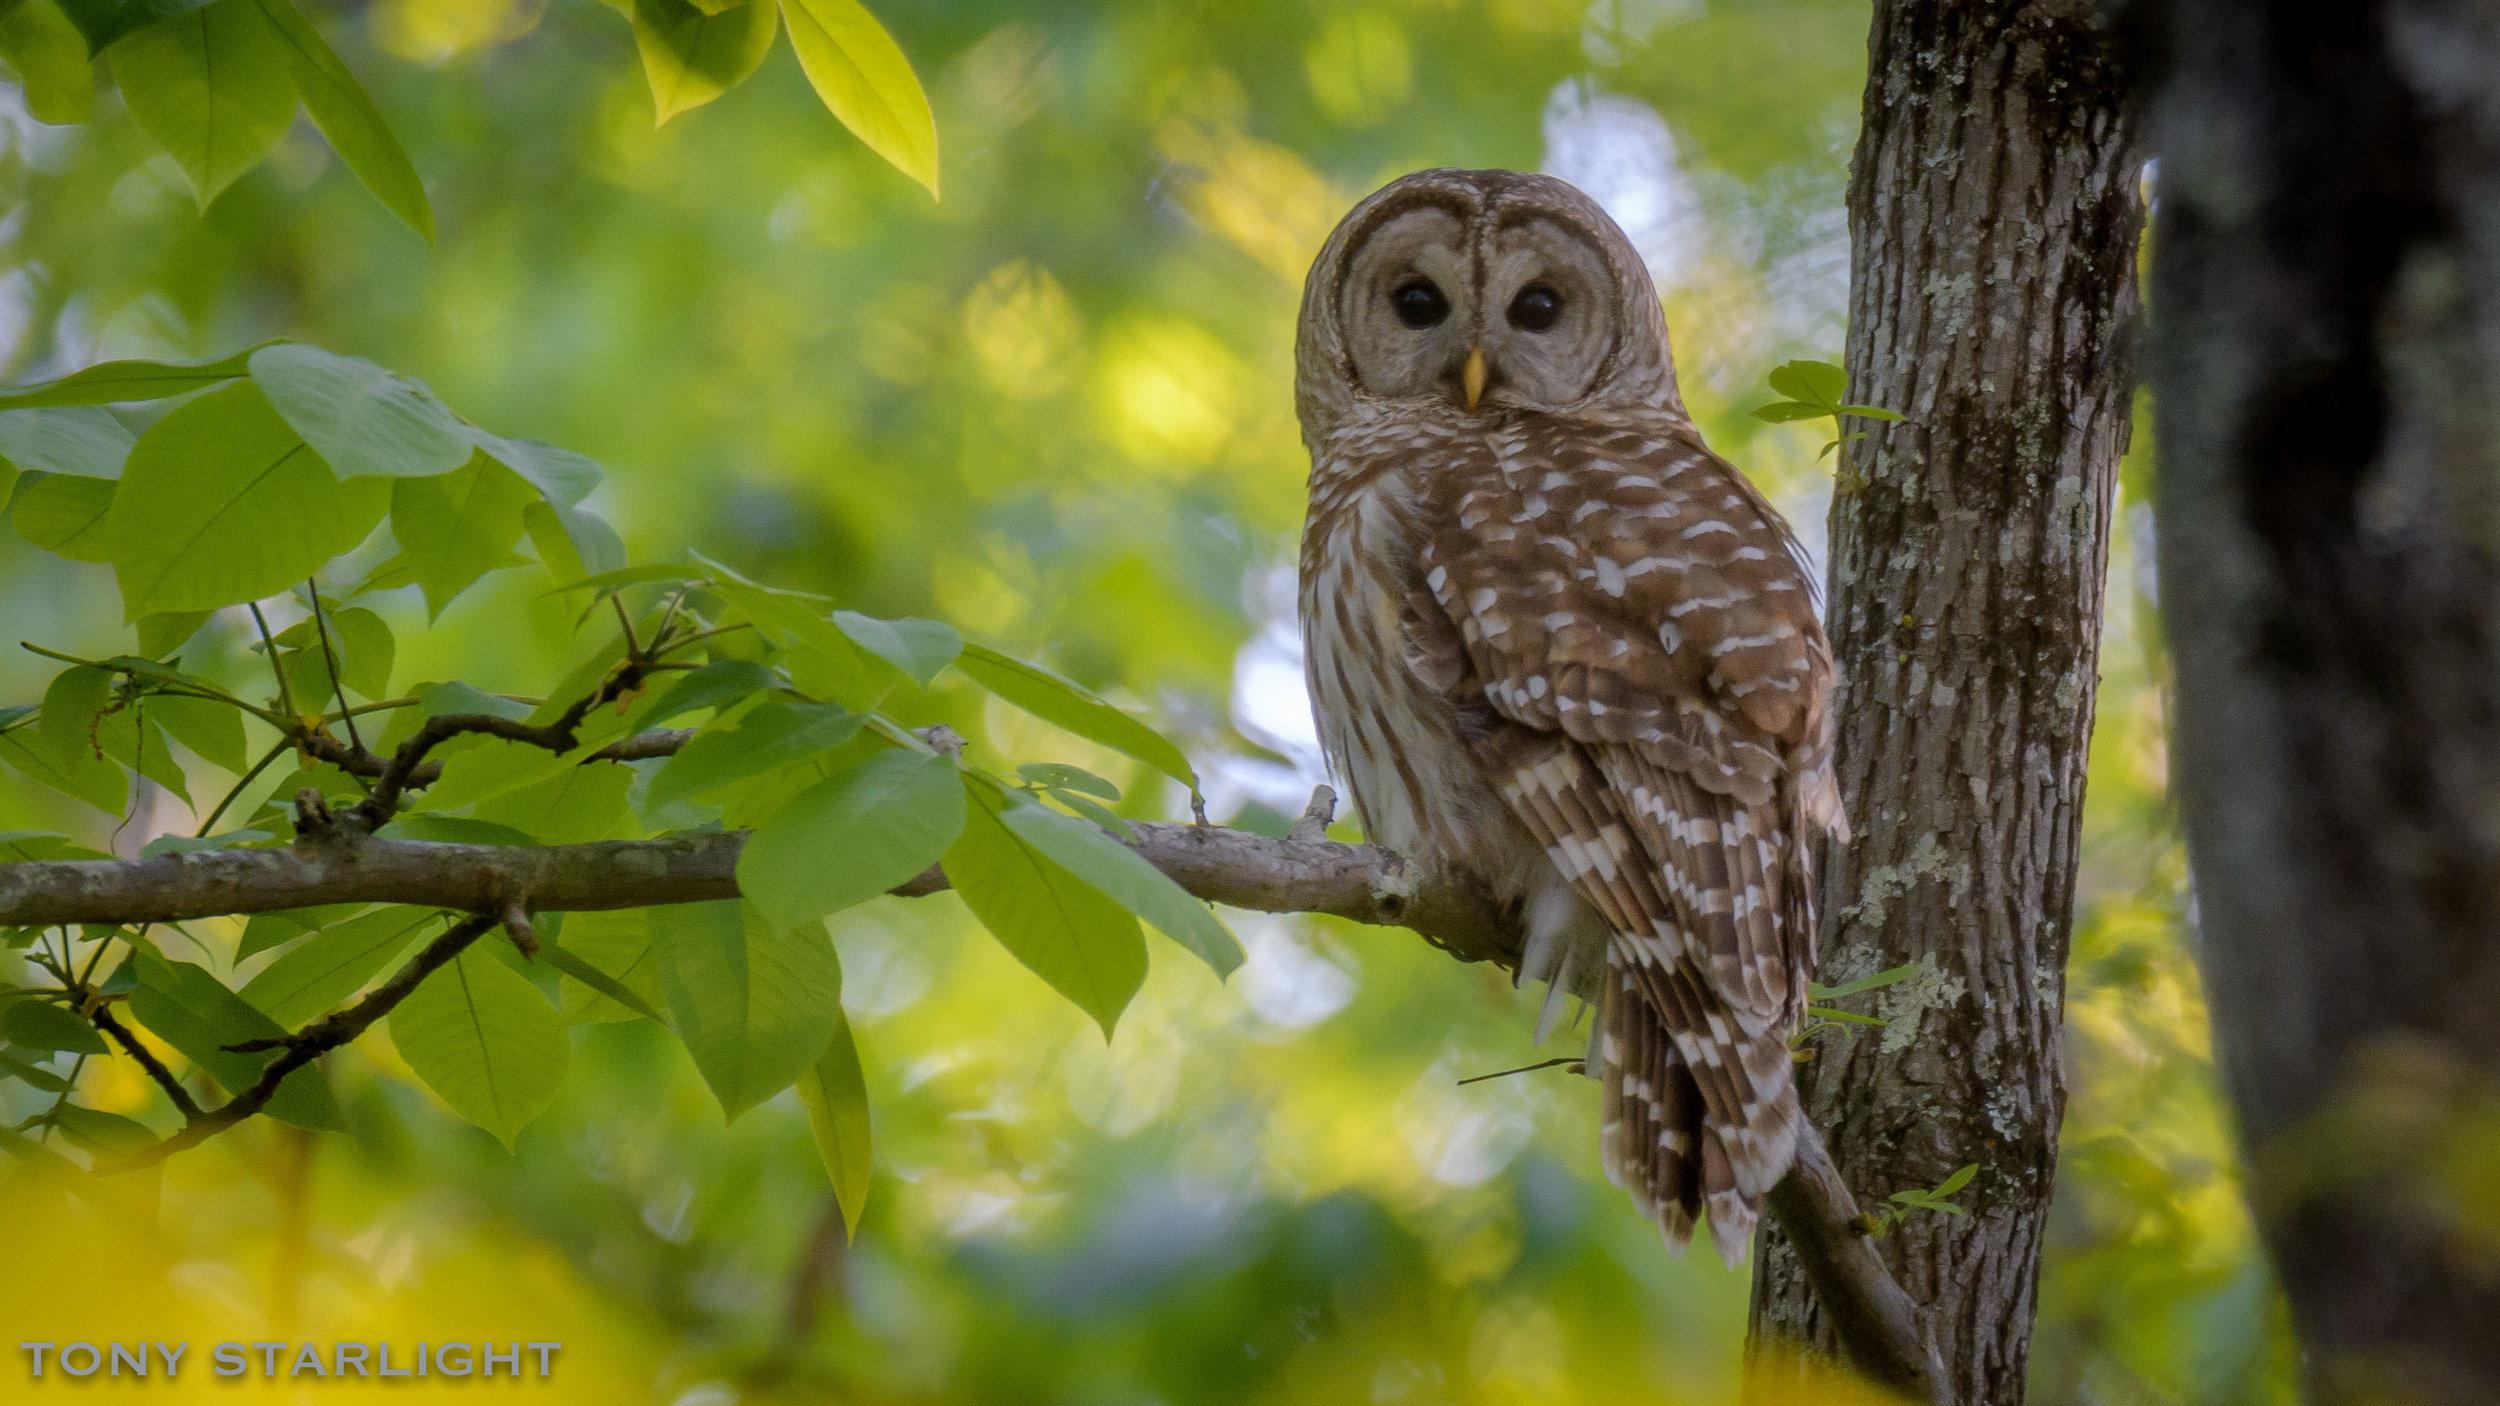 204) Barred Owl - April 4, 2017Rome, Georgia